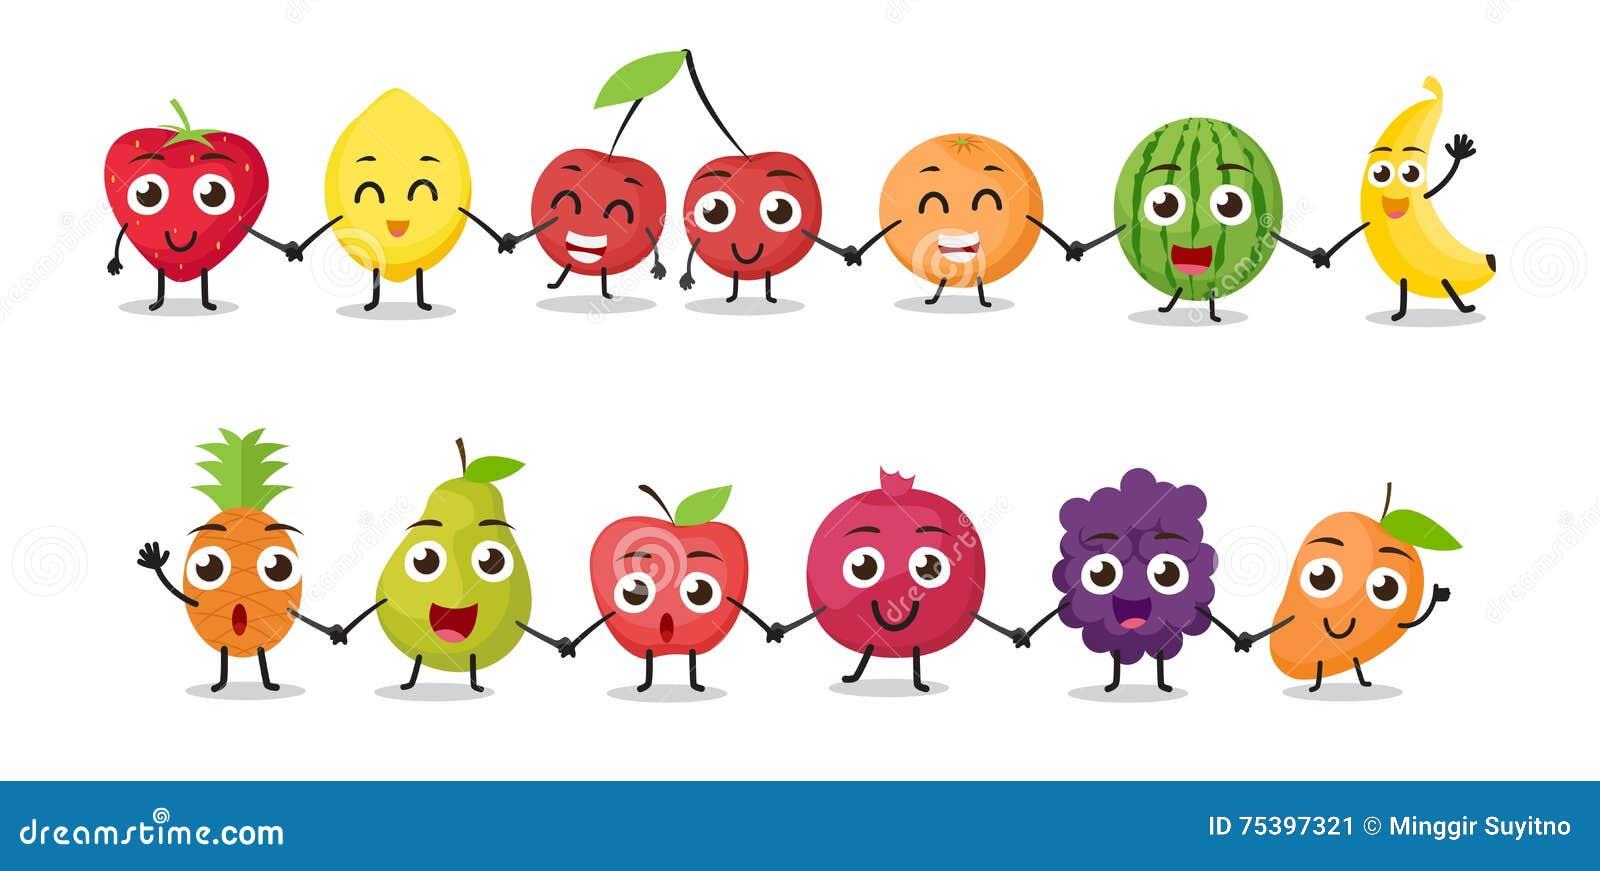 Cartoon Characters Holding Hands : Cartoon fruits characters stock vector image of juicy